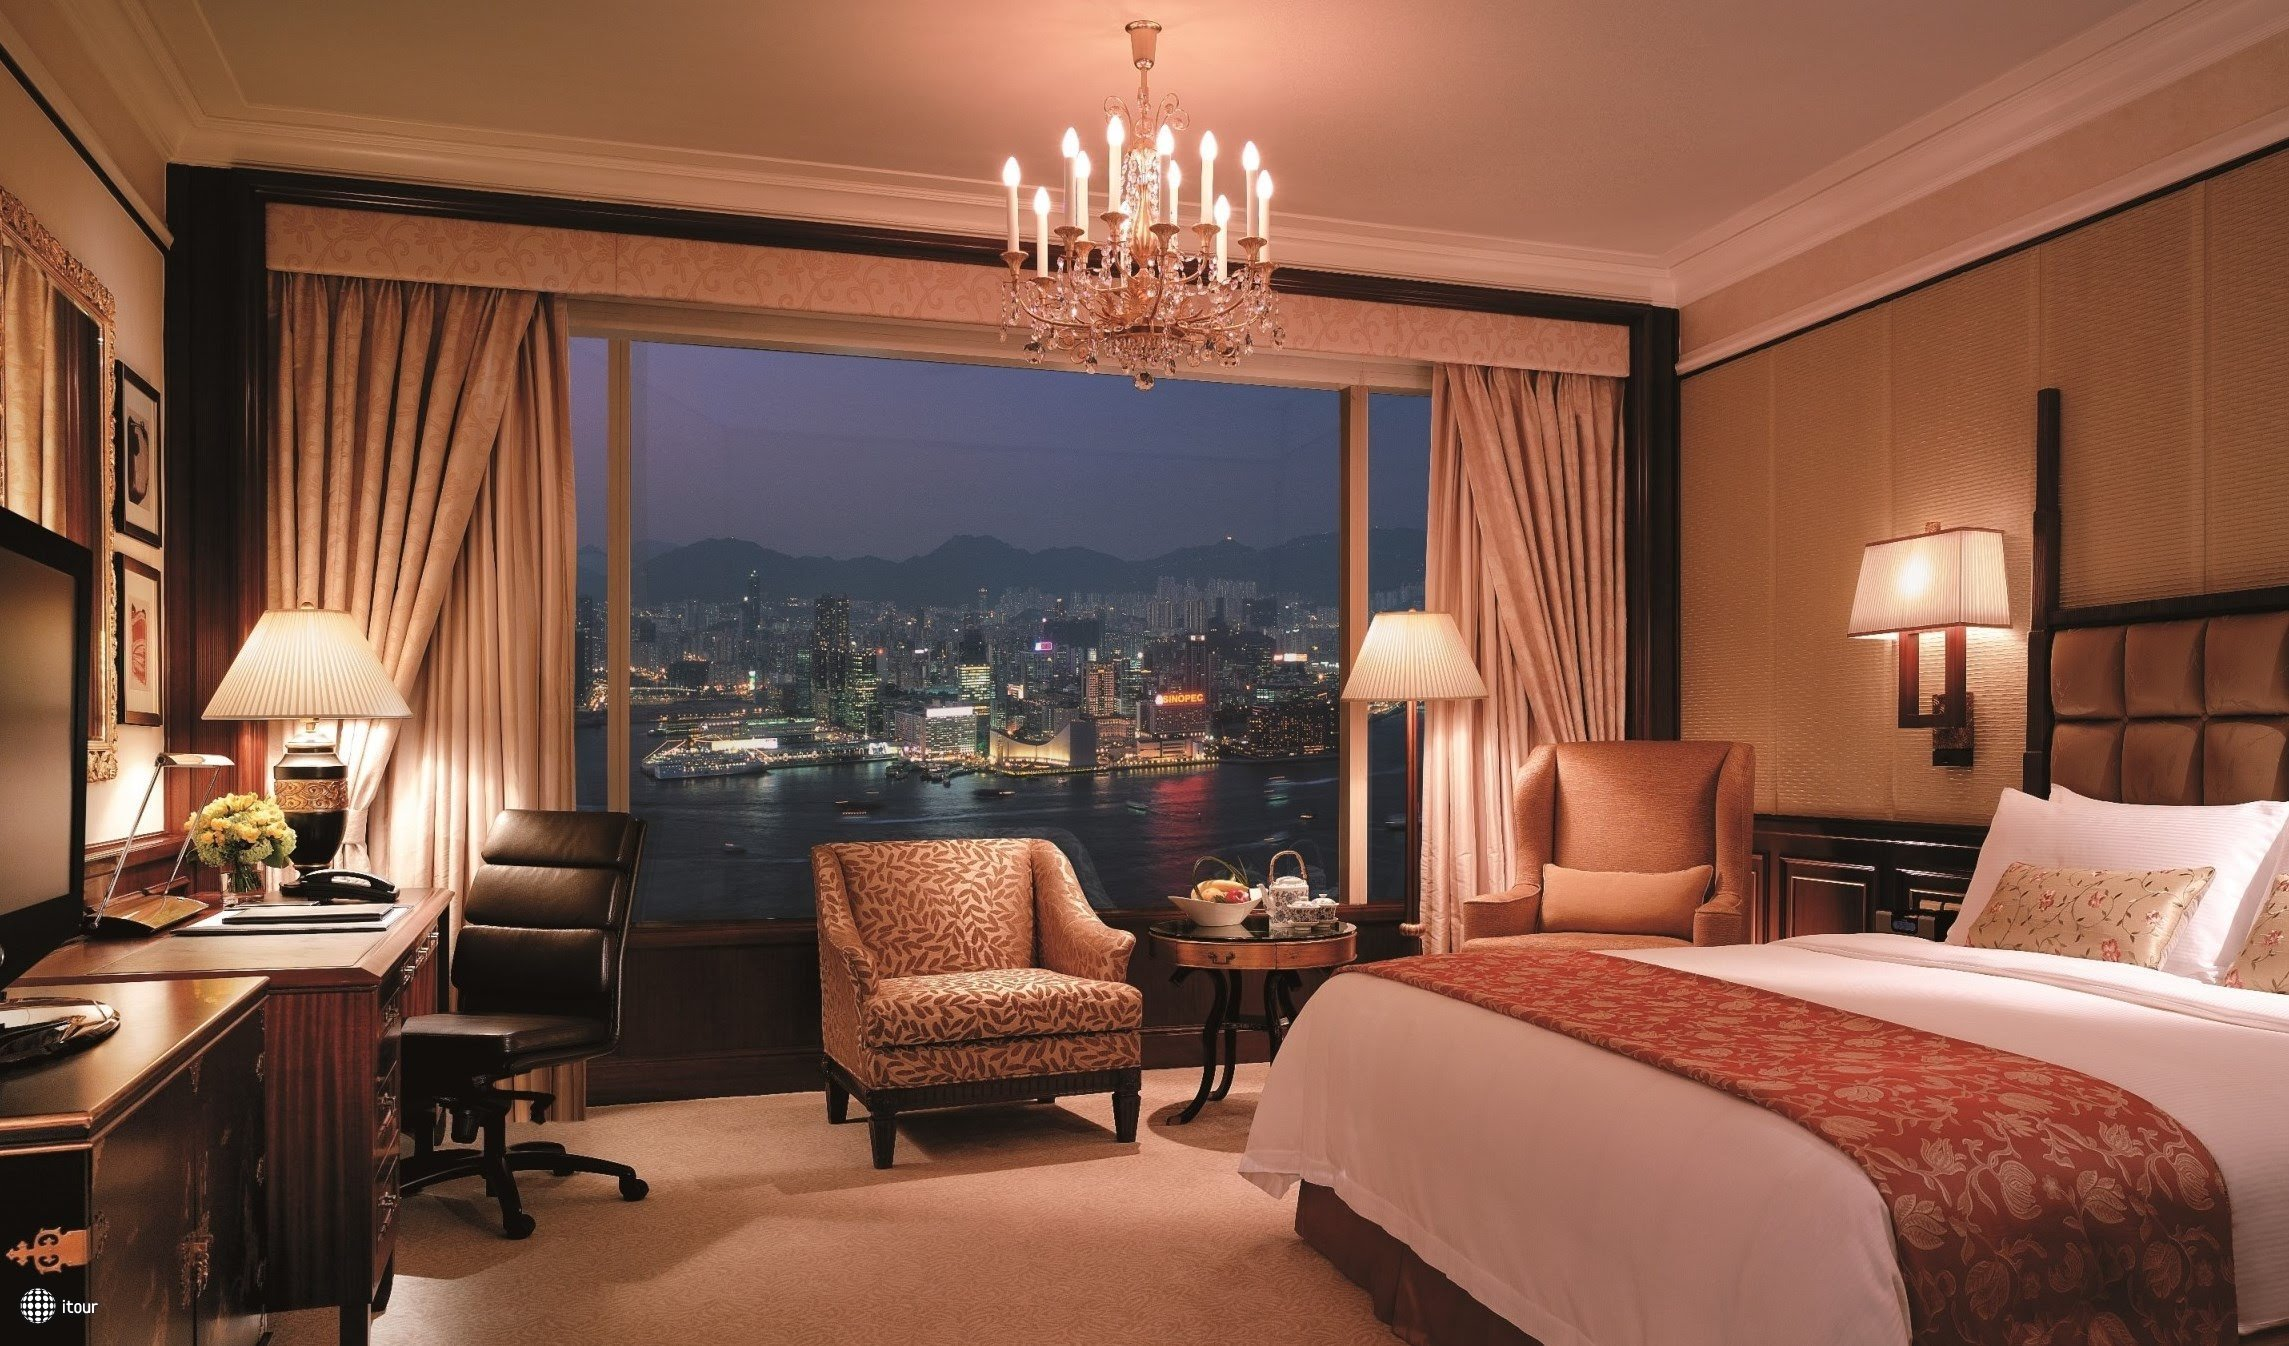 Kowloon Shangri-la 3